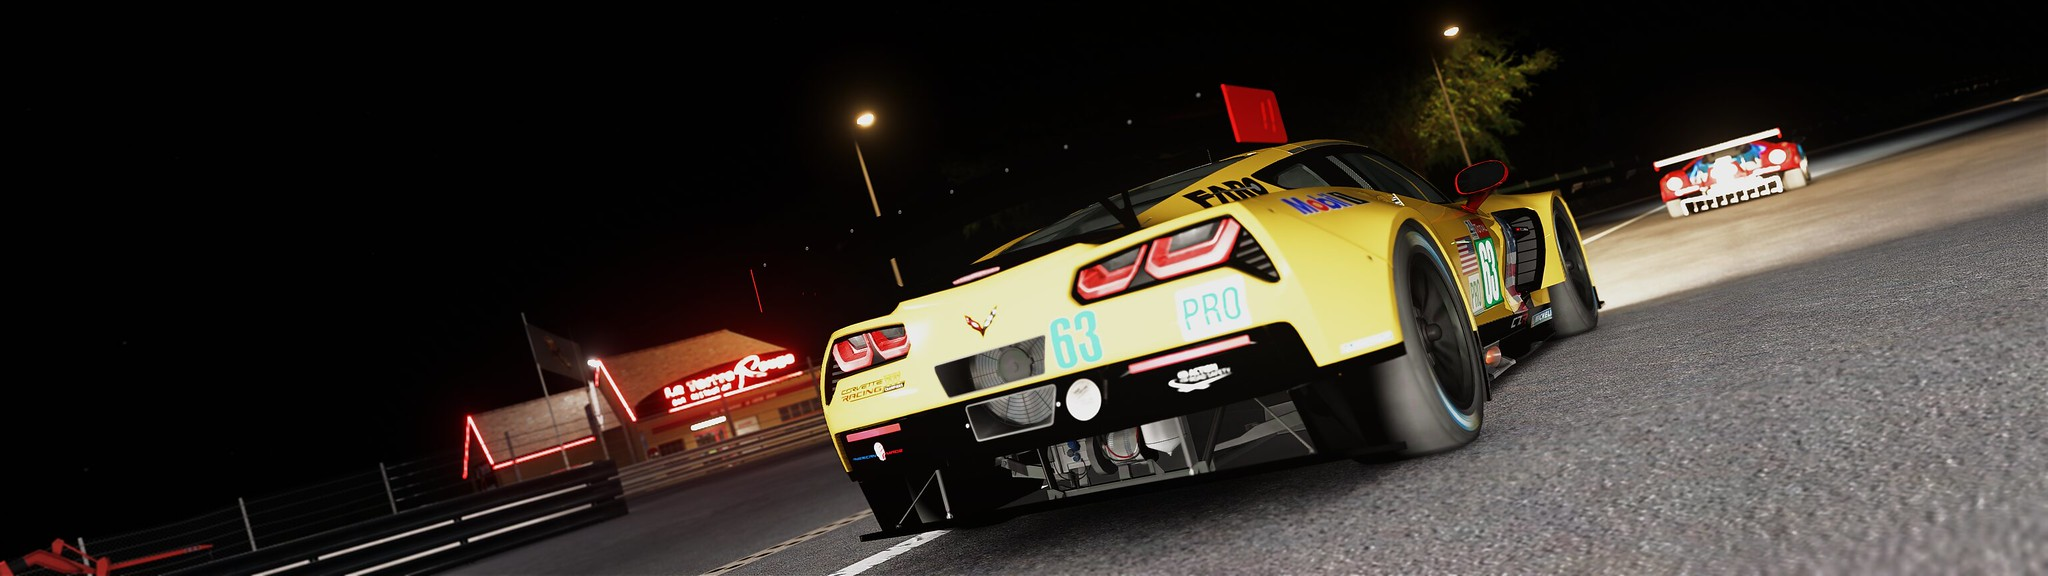 Assetto Corsa - Test Setup Mod Graphic Fx & Sound (Circuit 24 Le Mans) 49416411237_aad8cf0b7f_k